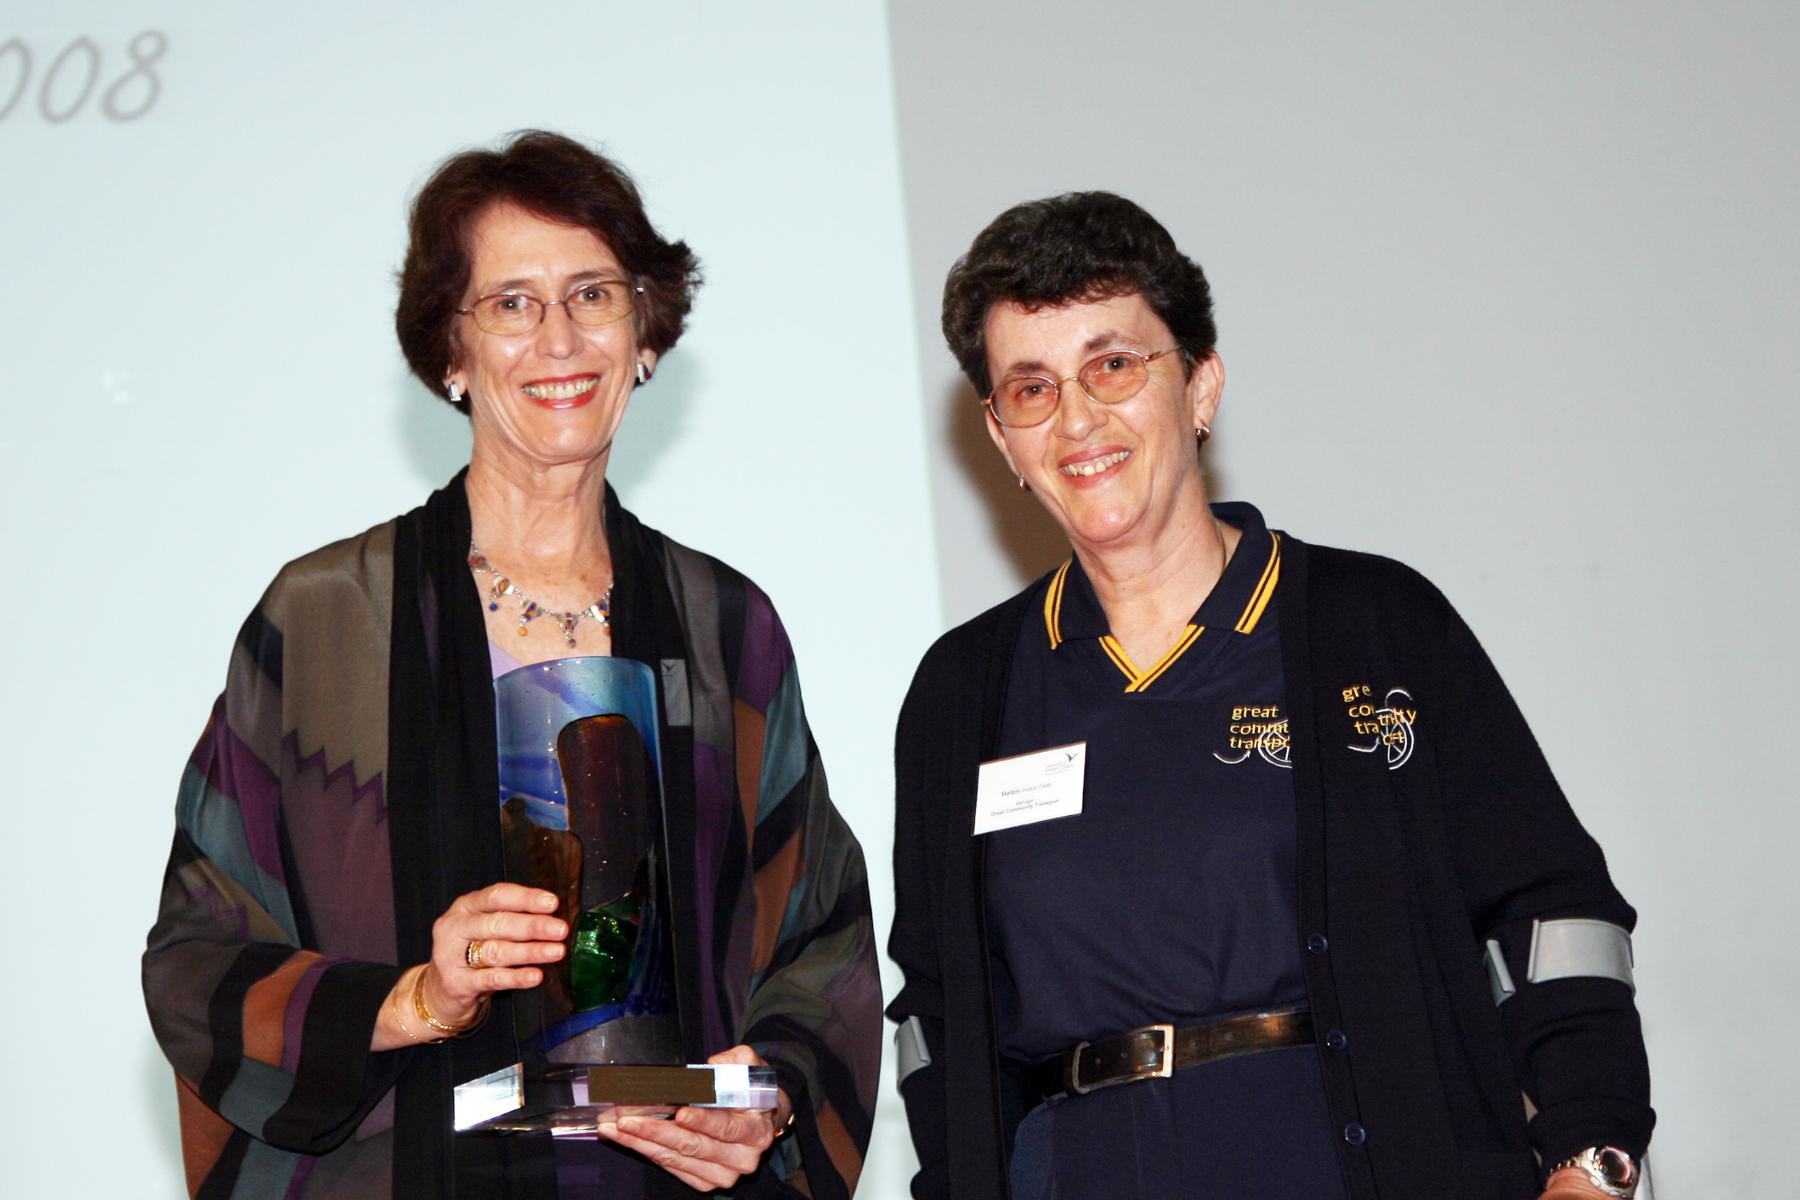 Winner of the UWS Women of the West Award for 2008 – Helen Walker OAM with Vice-Chancellor Professor Janice Reid AM.